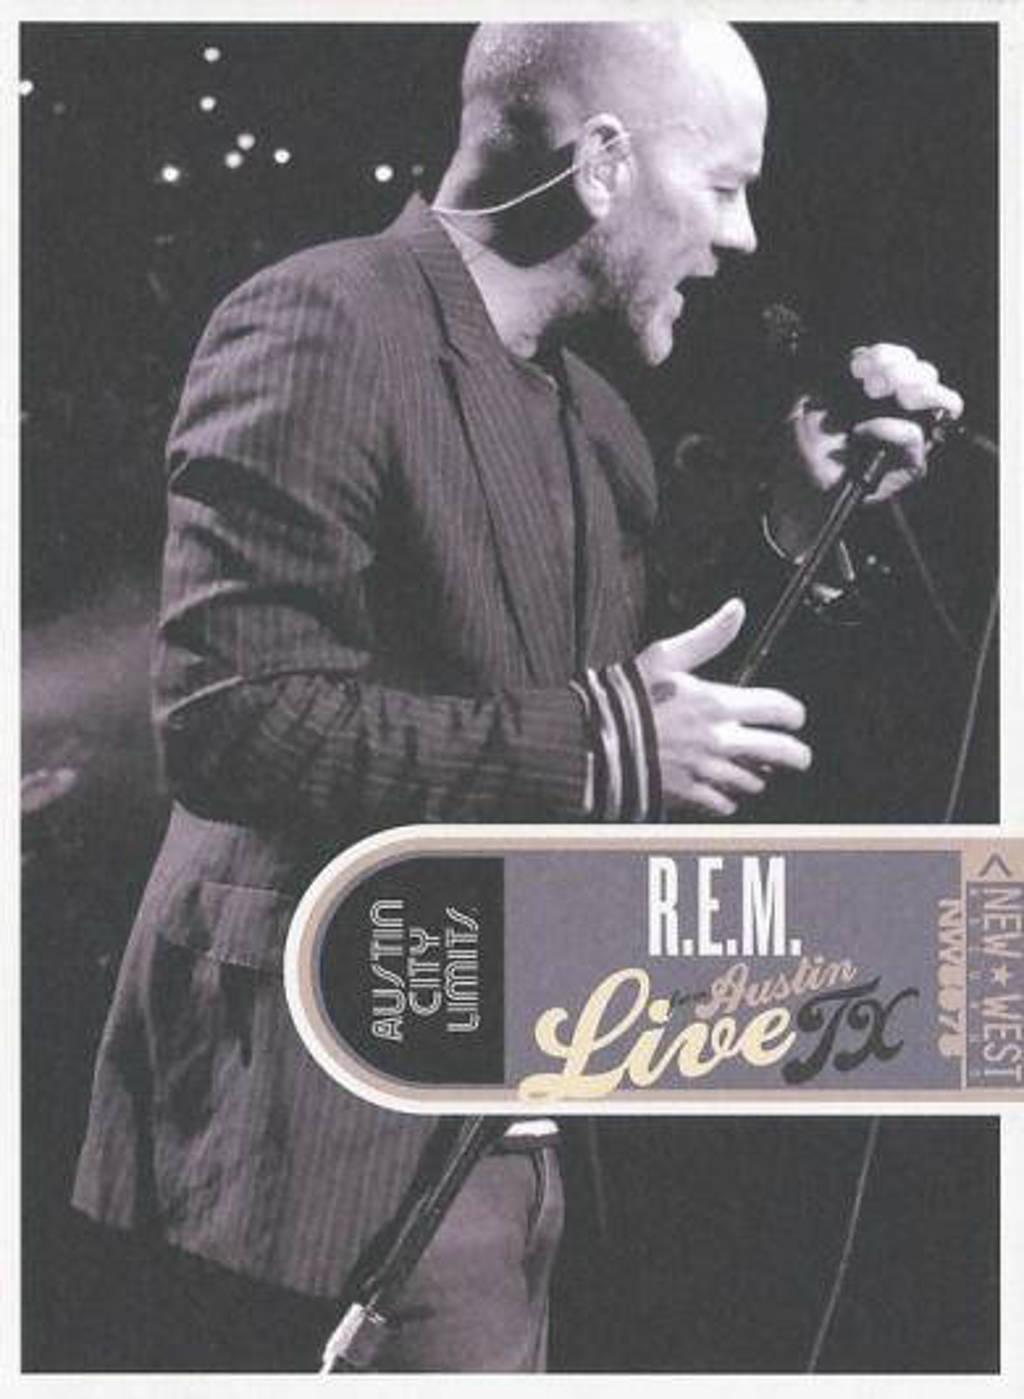 R.E.M. - Live from Austin Texas (DVD)